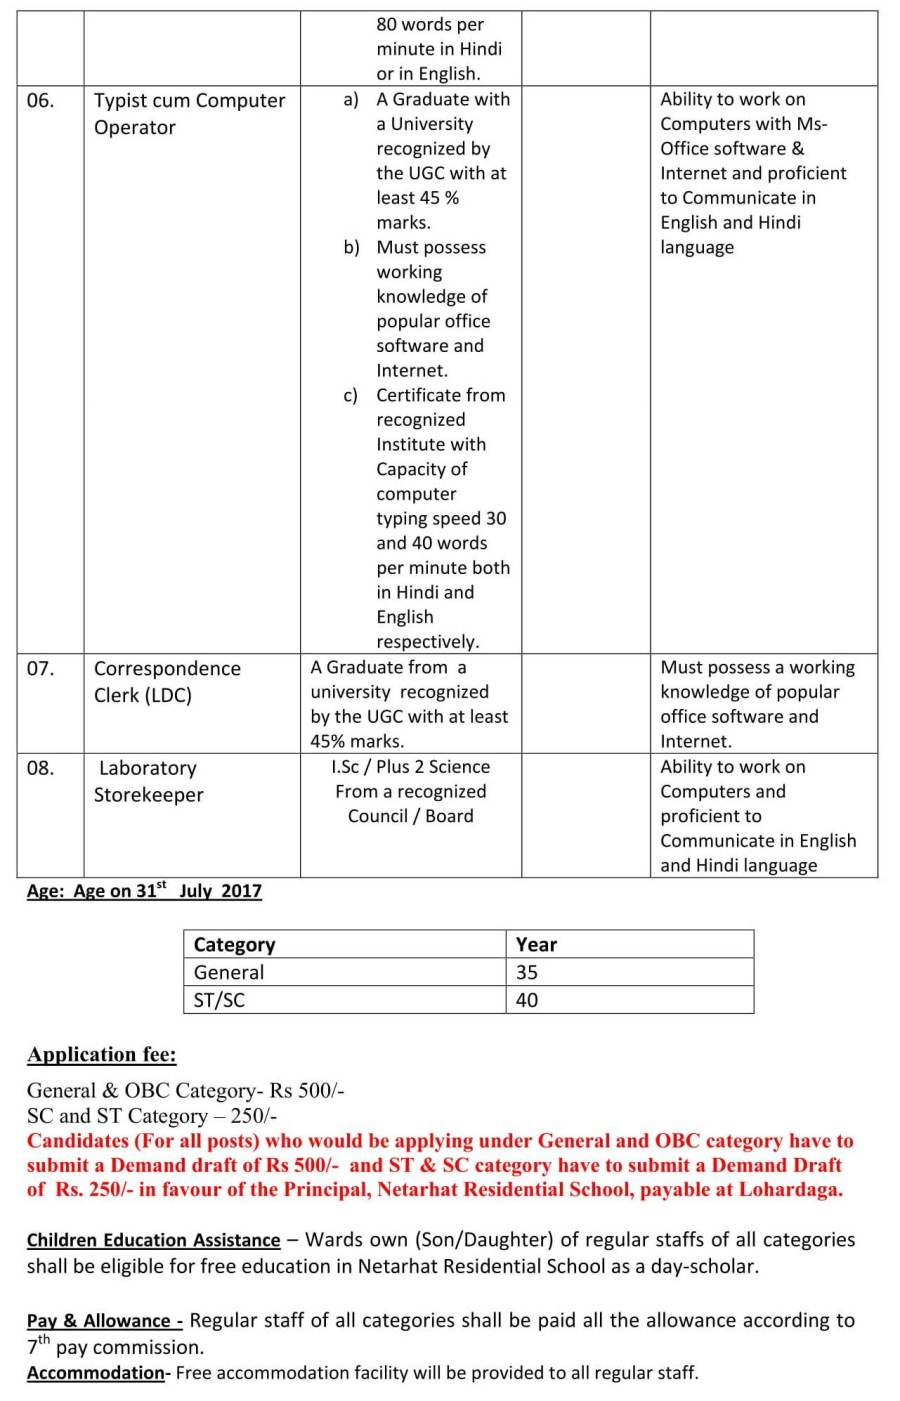 netarhatvidayalayasamiti_recruitment_advt-3.jpg